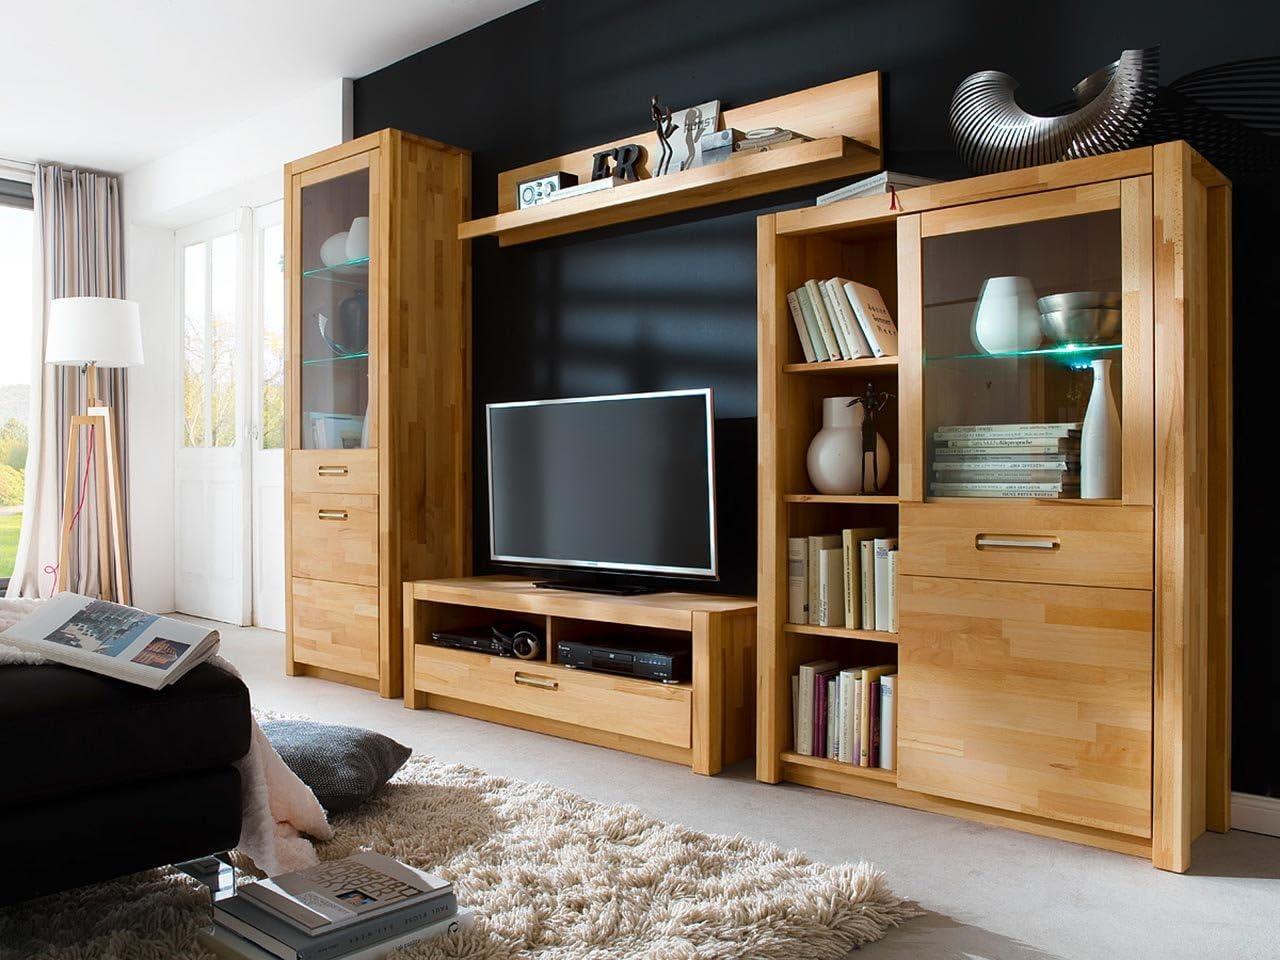 lifestyle16living Wohnwand, Wohnzimmerschrank, Anbauwand